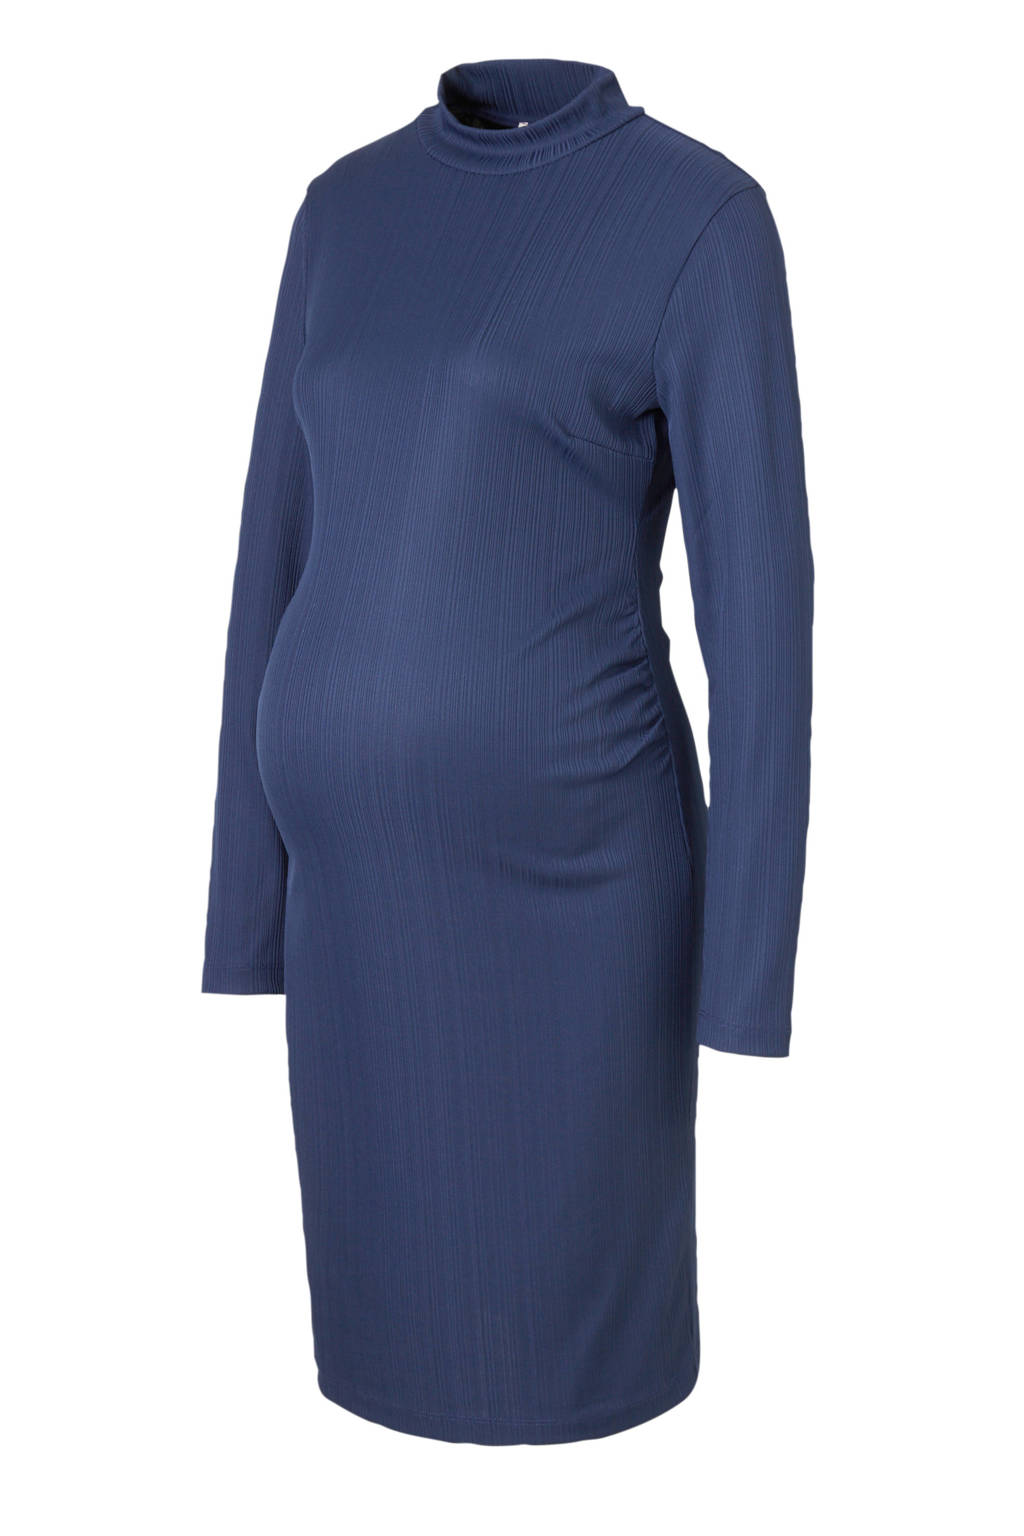 wehkamp zwangerschapsjurk donkerblauw, Donkerblauw